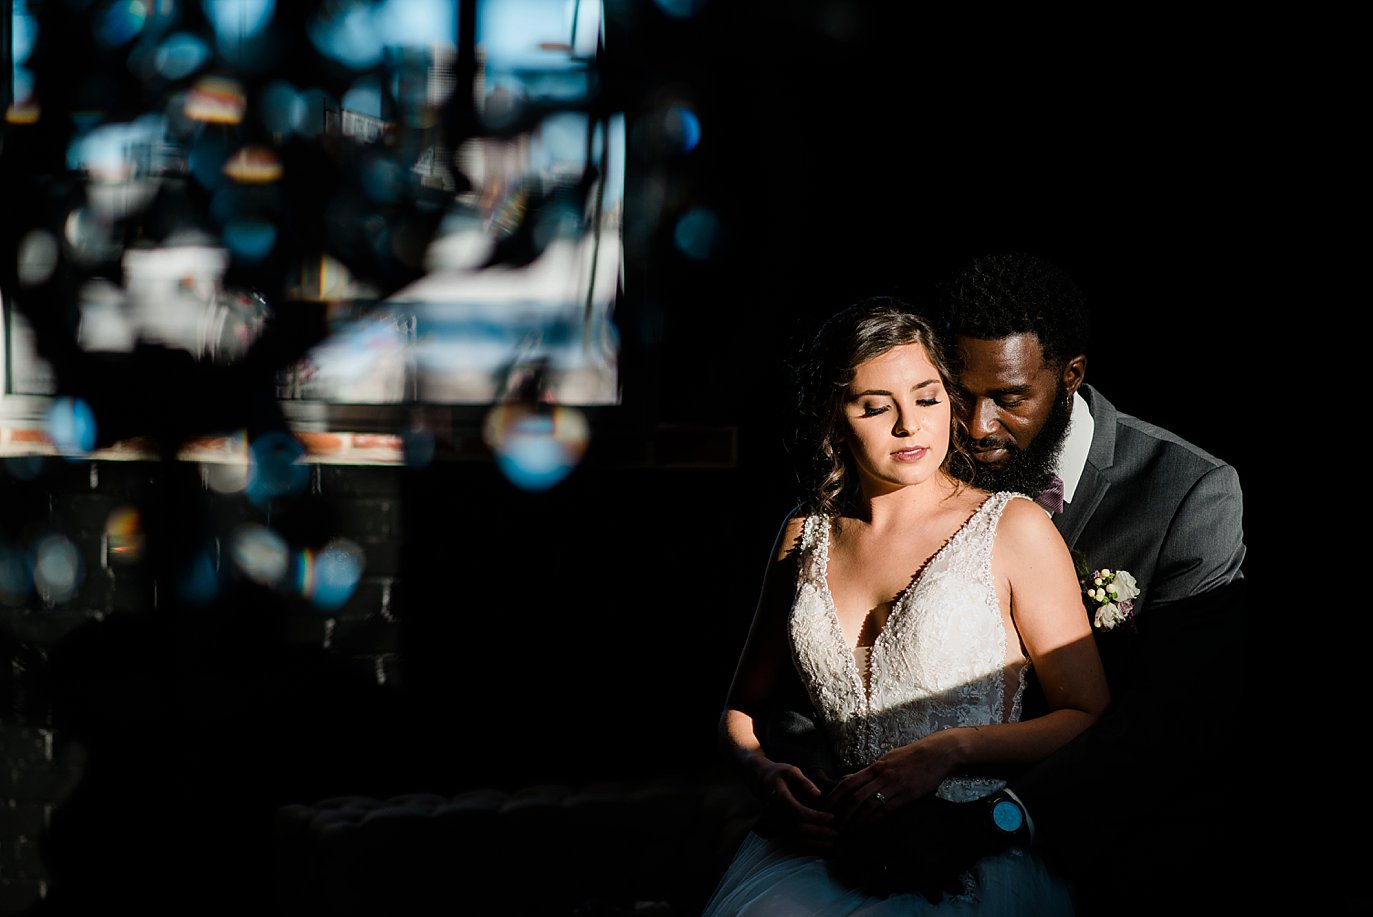 bride and groom creative portrait at Shyft Denver wedding by Lyons wedding photographer Jennie Crate